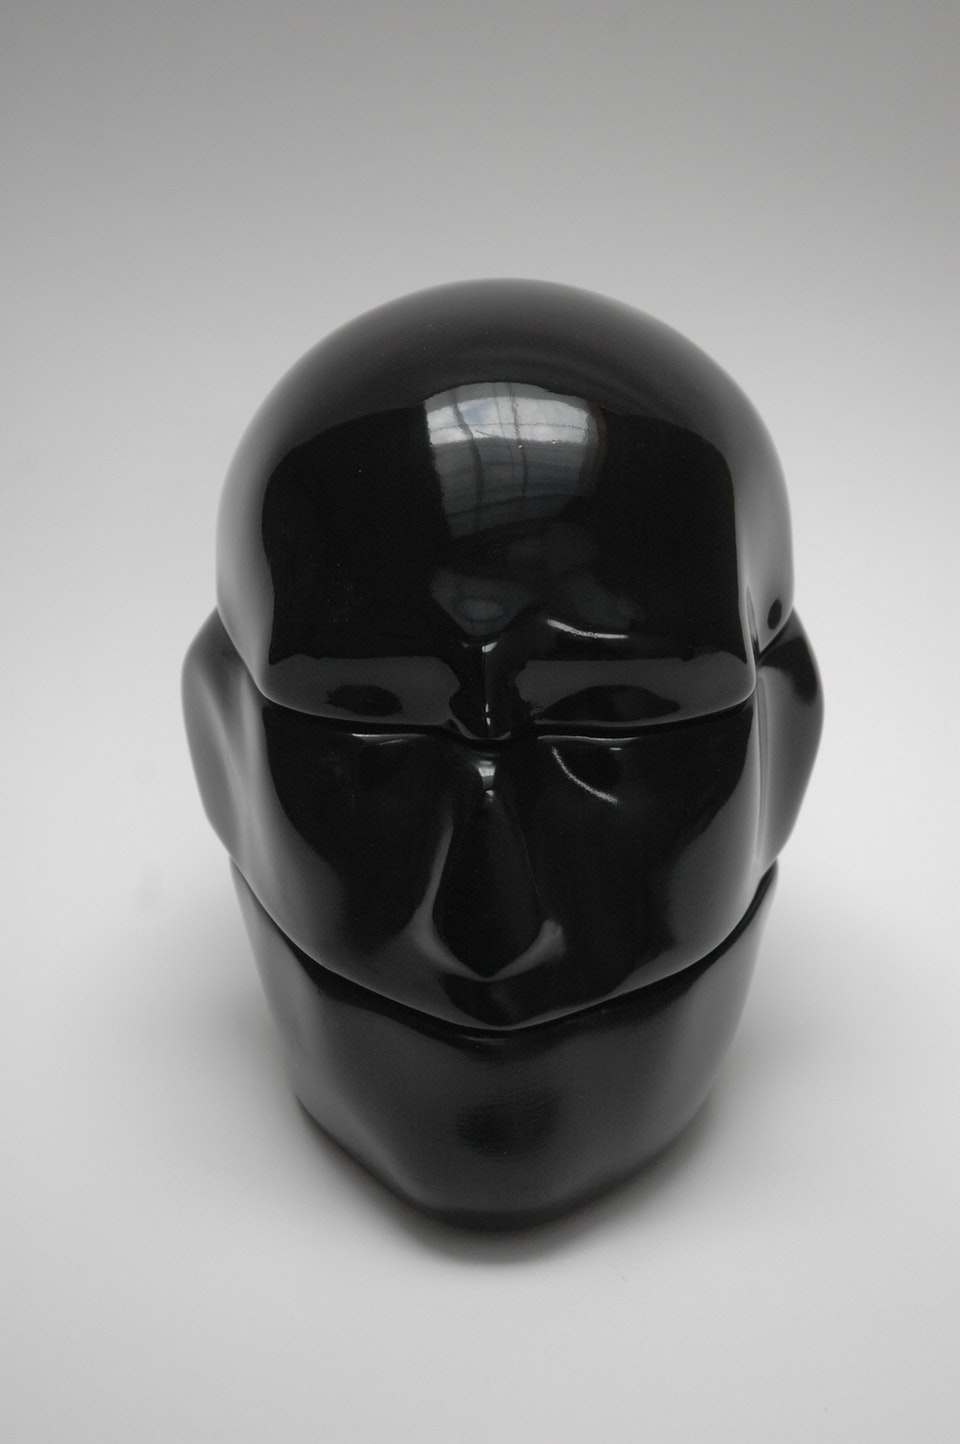 Autokopf Black 05053D86-46DD-4CD5-8C78-E2E11CB8ABCC